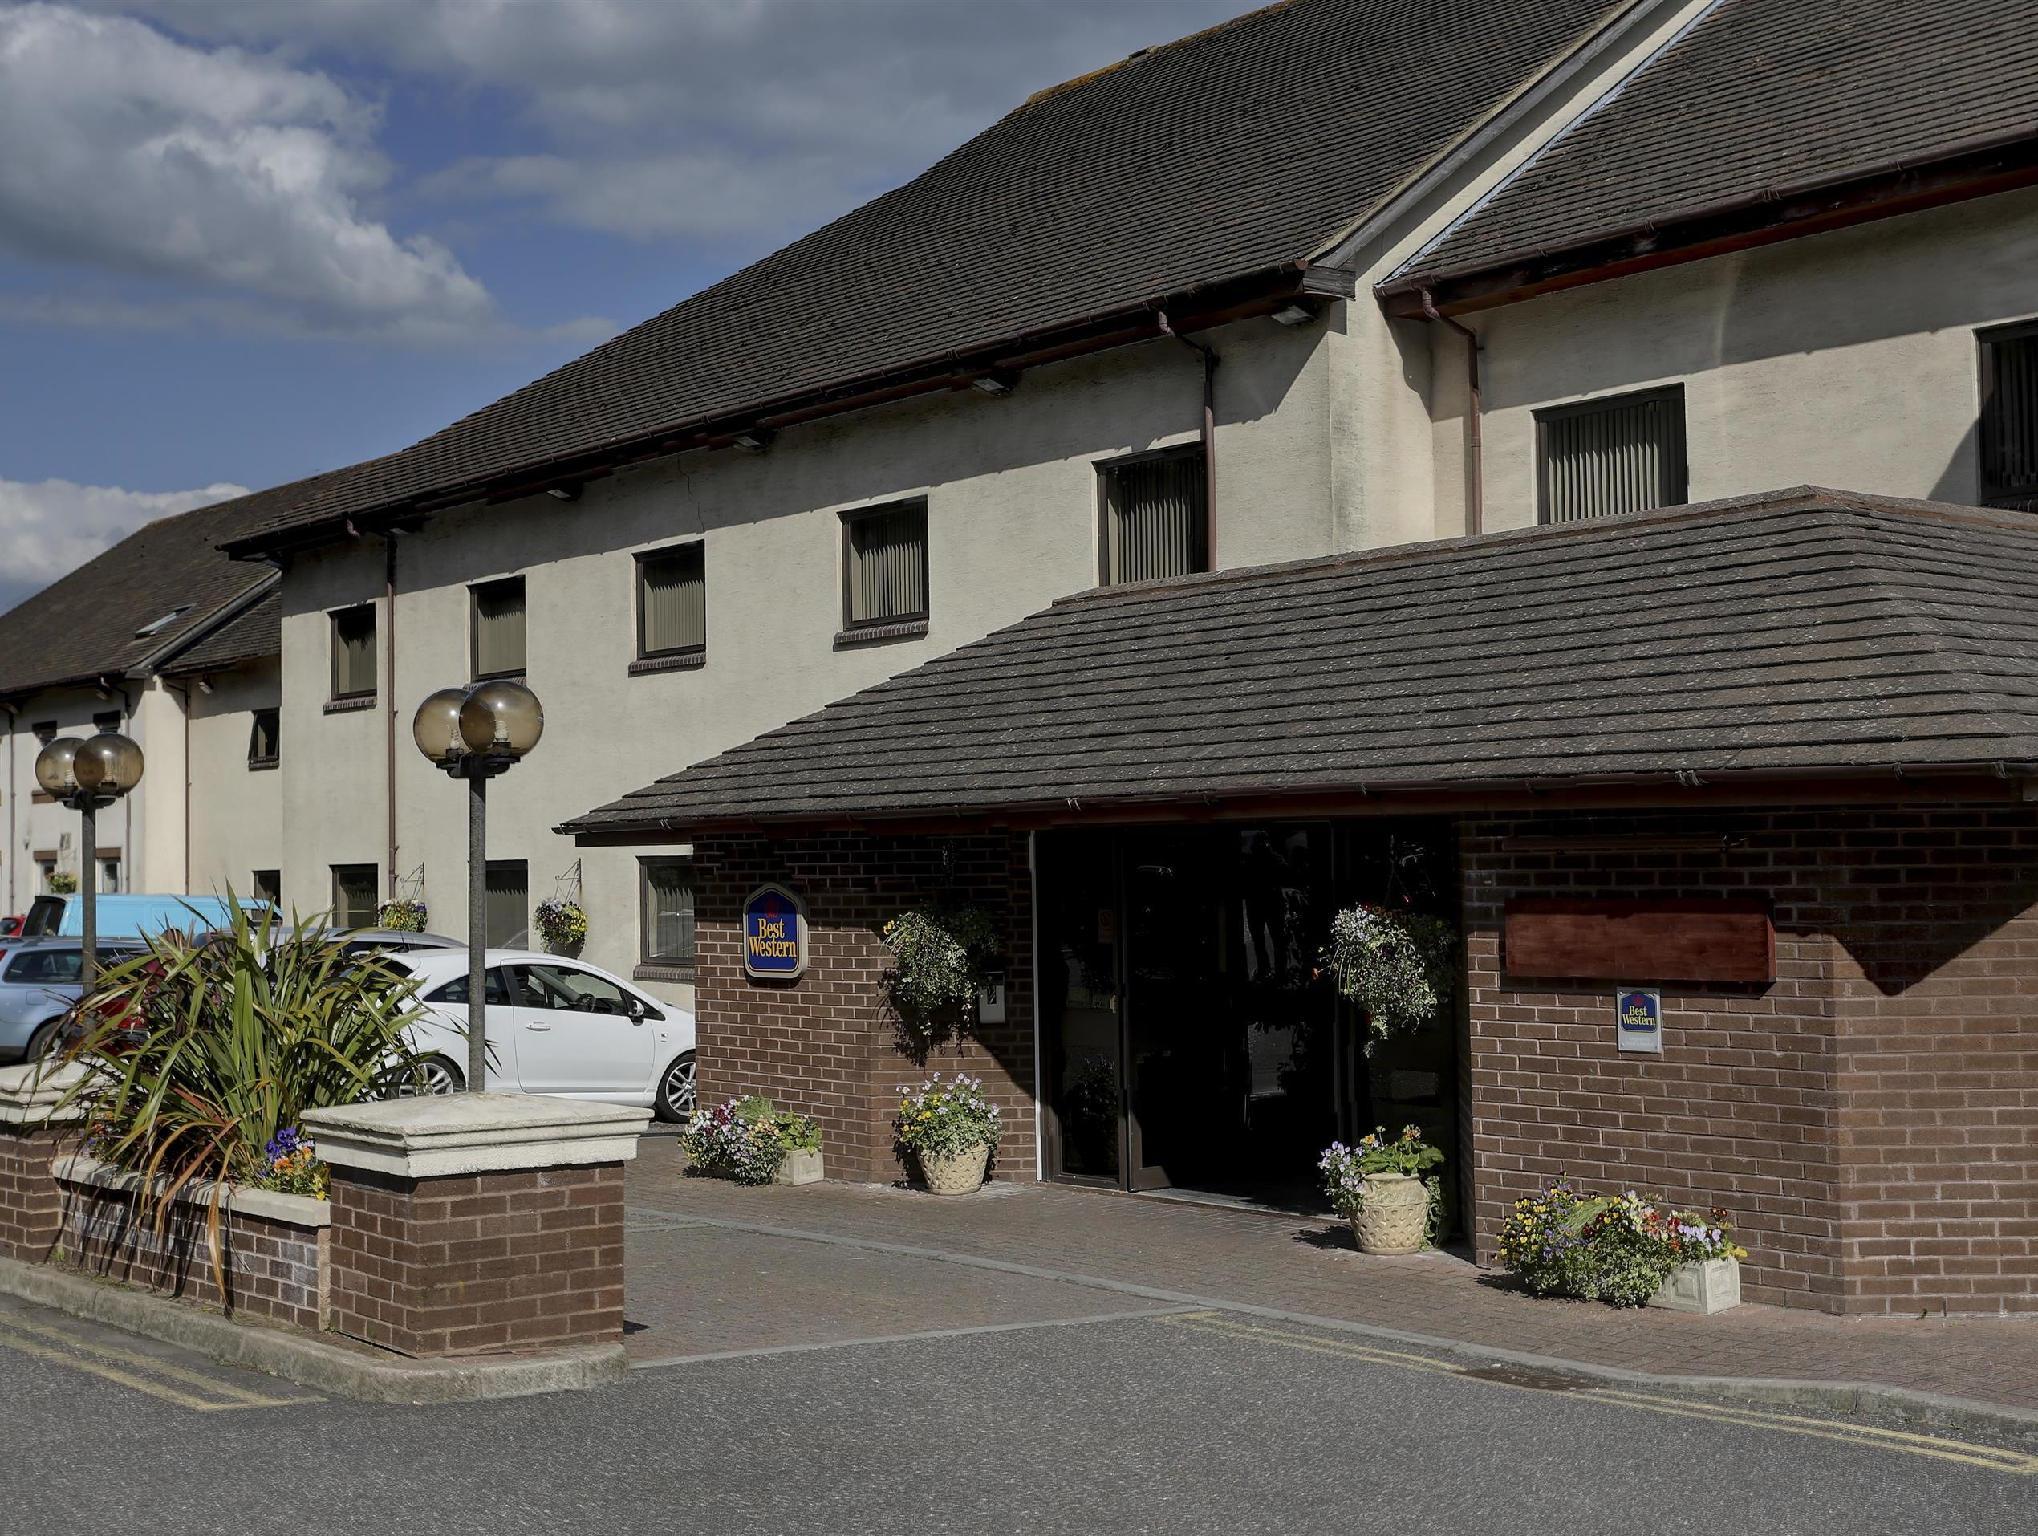 Passage House Hotel